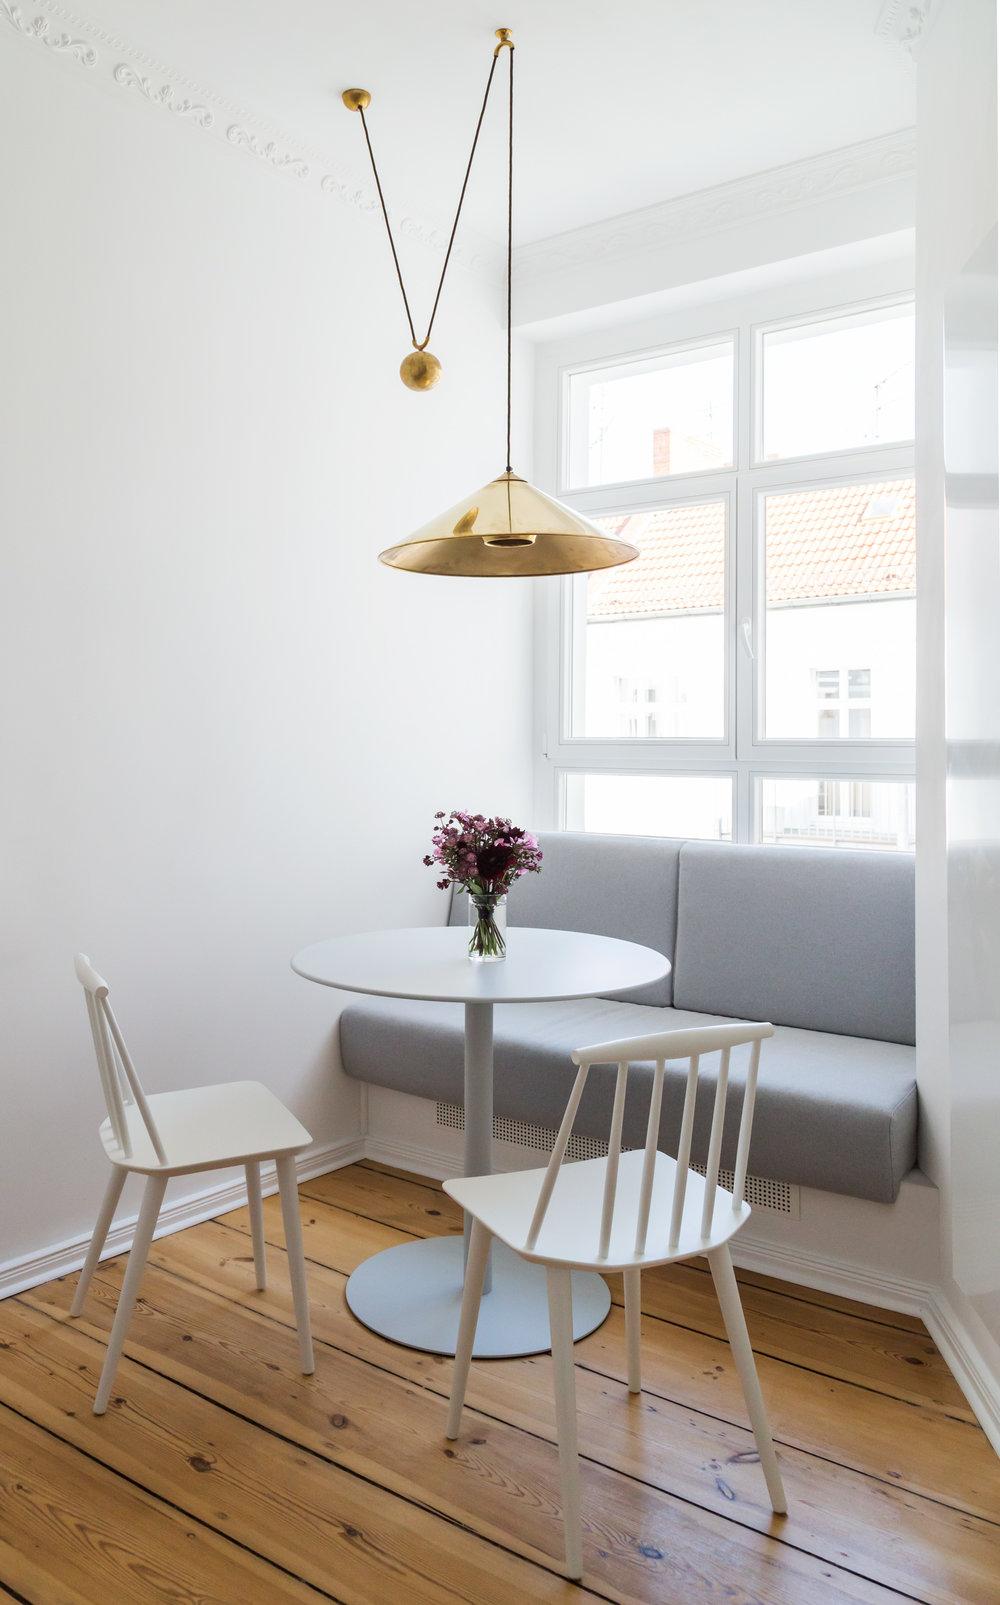 06-White_Arrow-Paul-Lincke-Ufer-Apartment.jpg